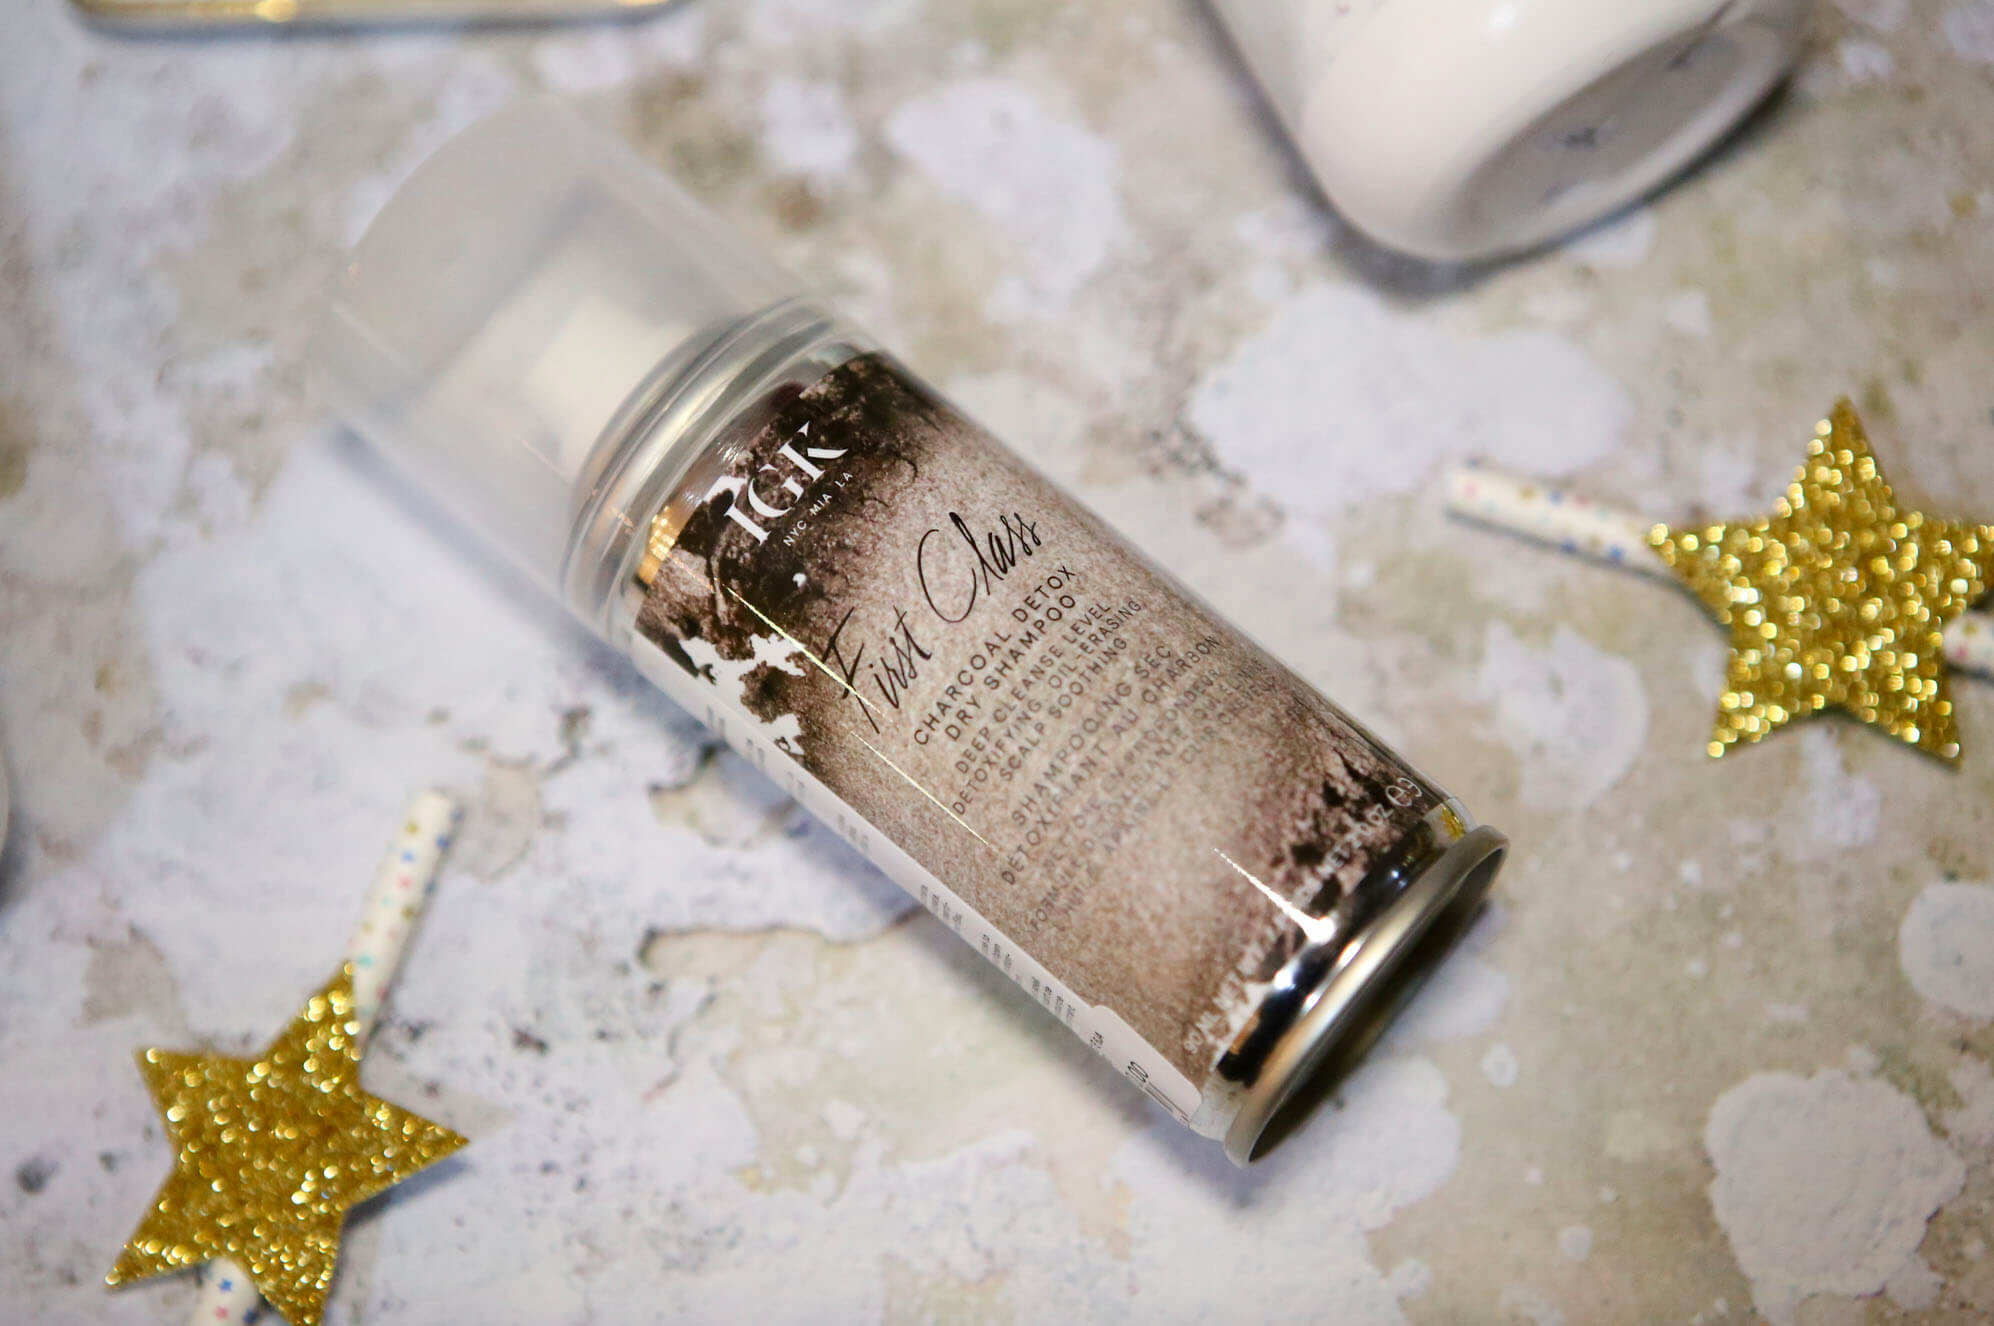 IGK Dry Shampoo